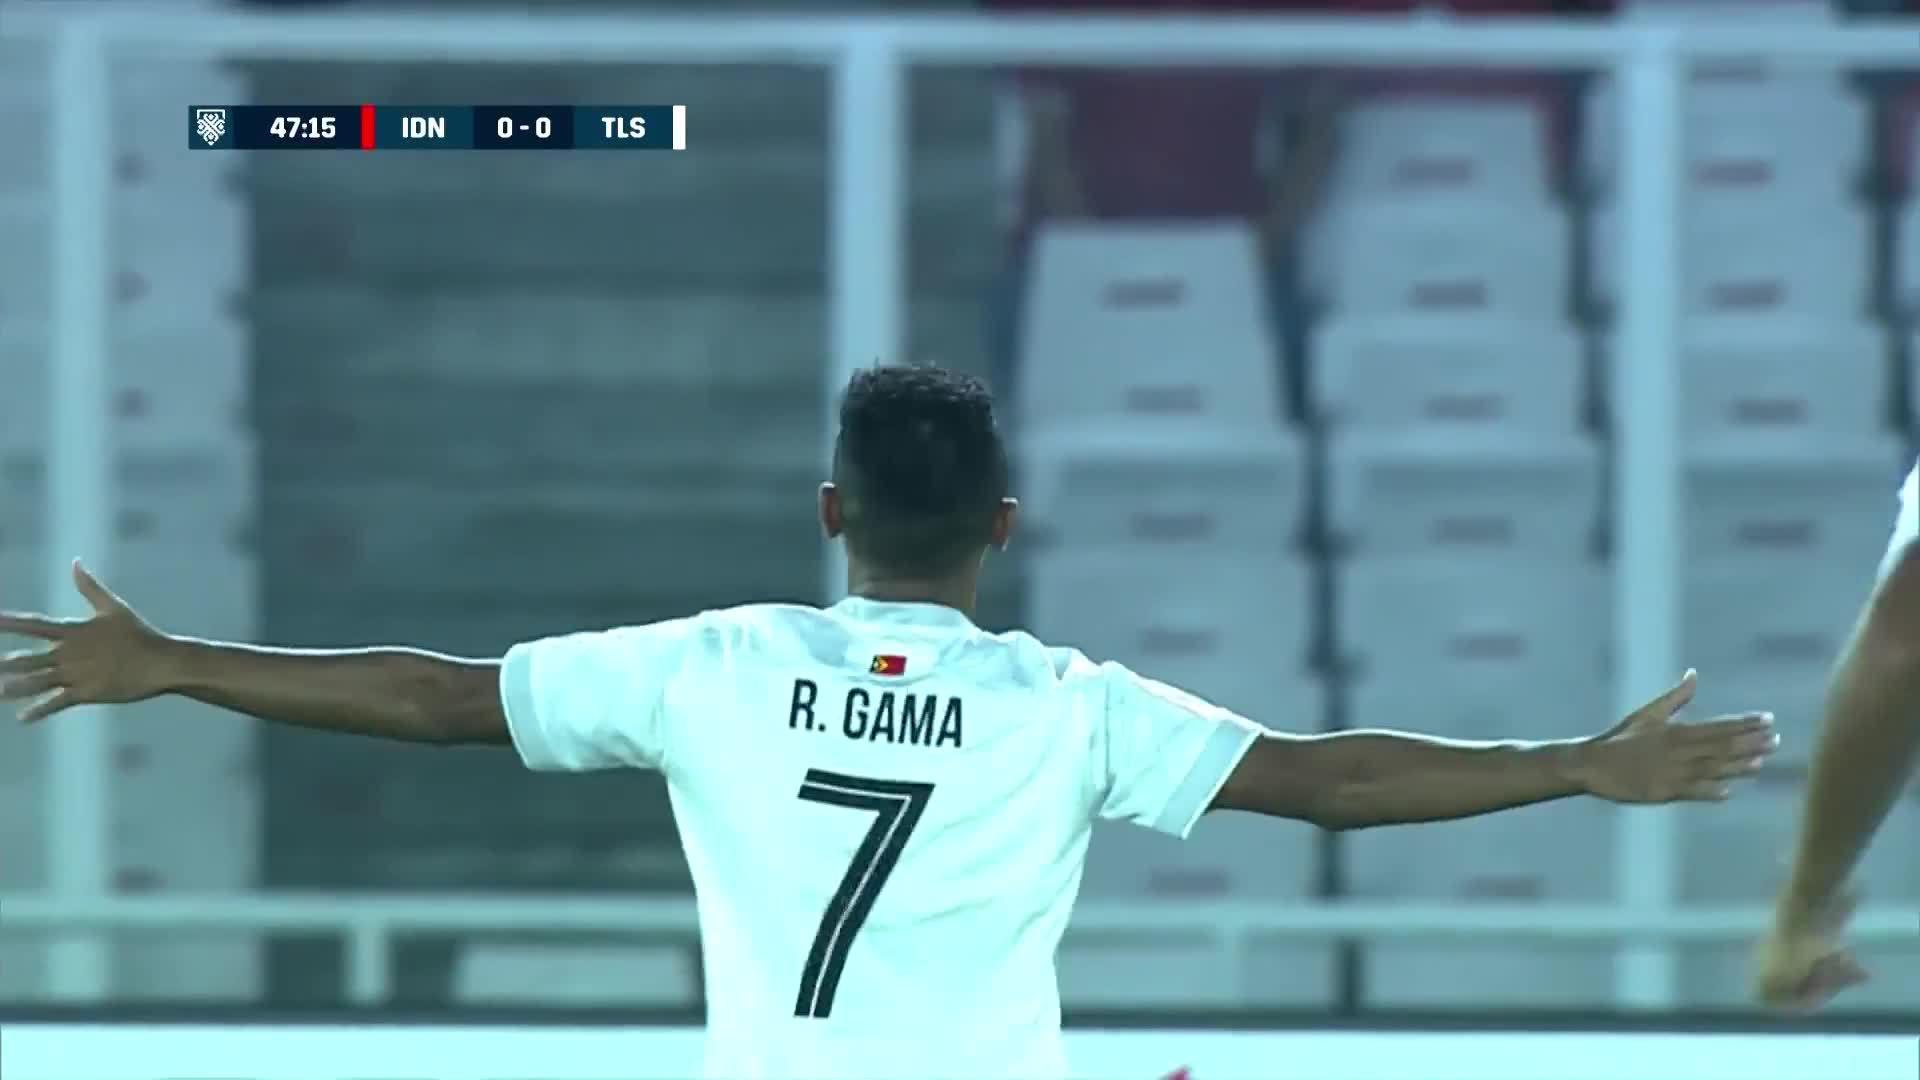 Rufino Gama (Timor Leste 1-3 Indonesia)